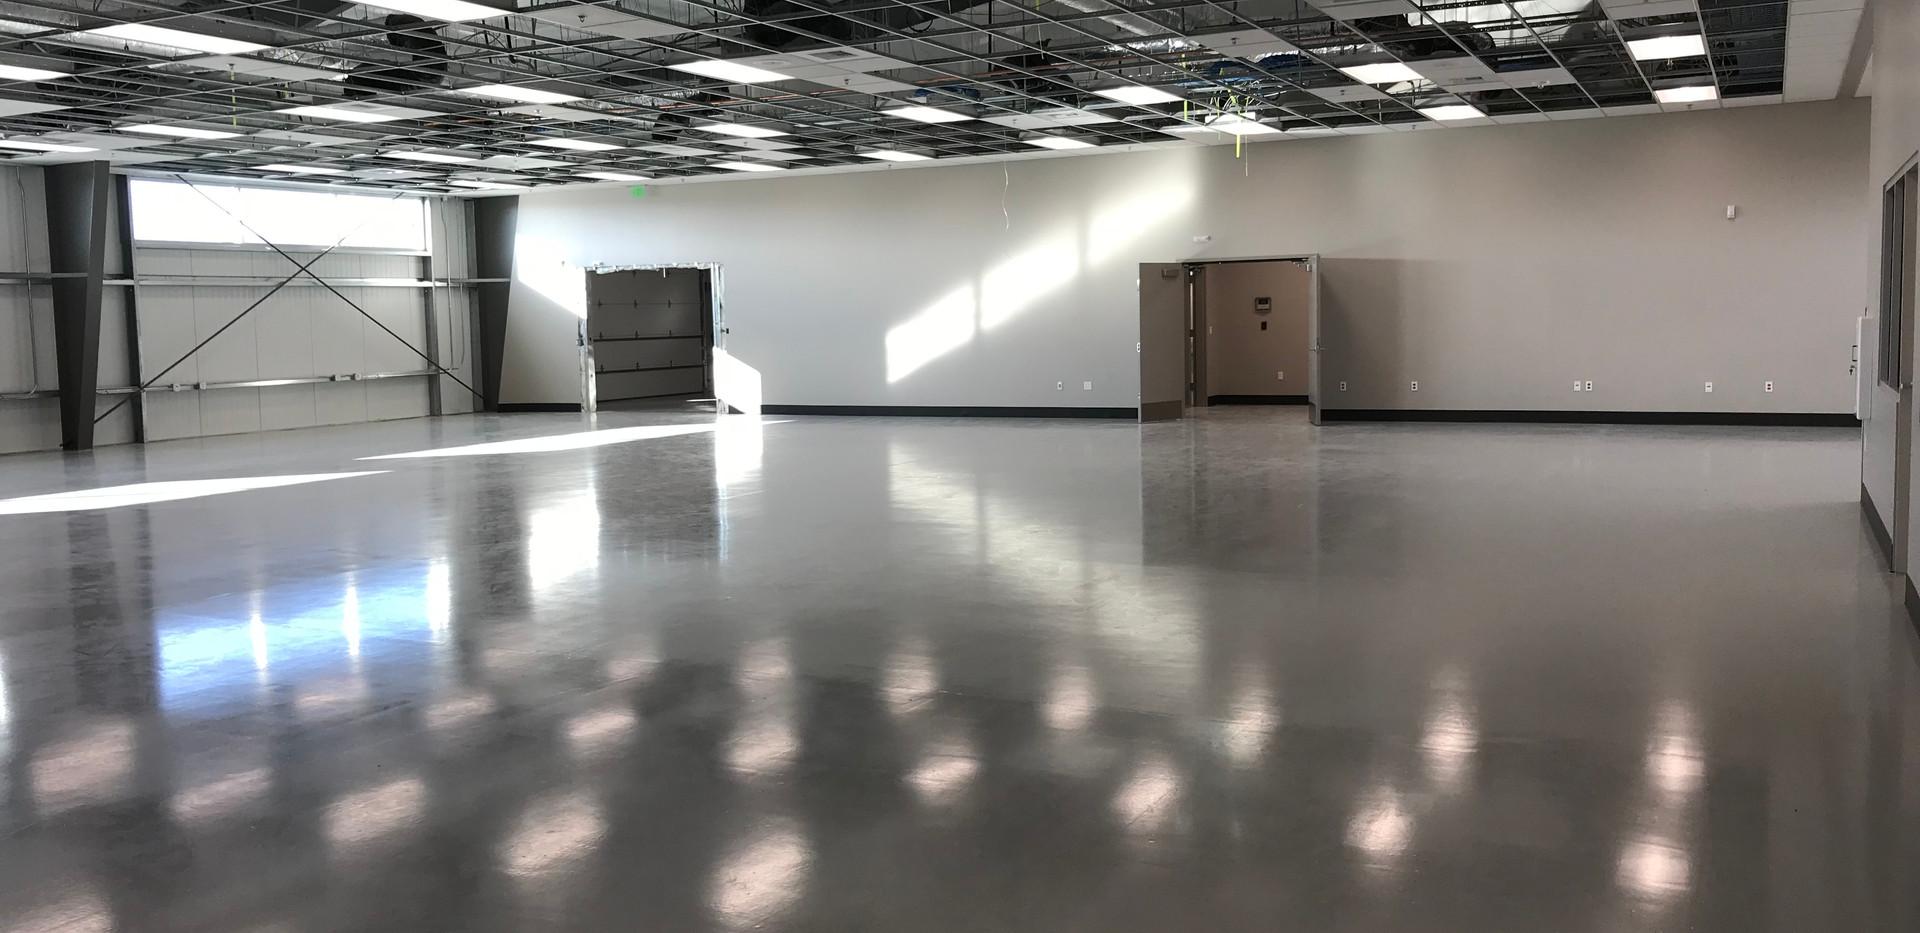 2018 YVFWC Metal Building